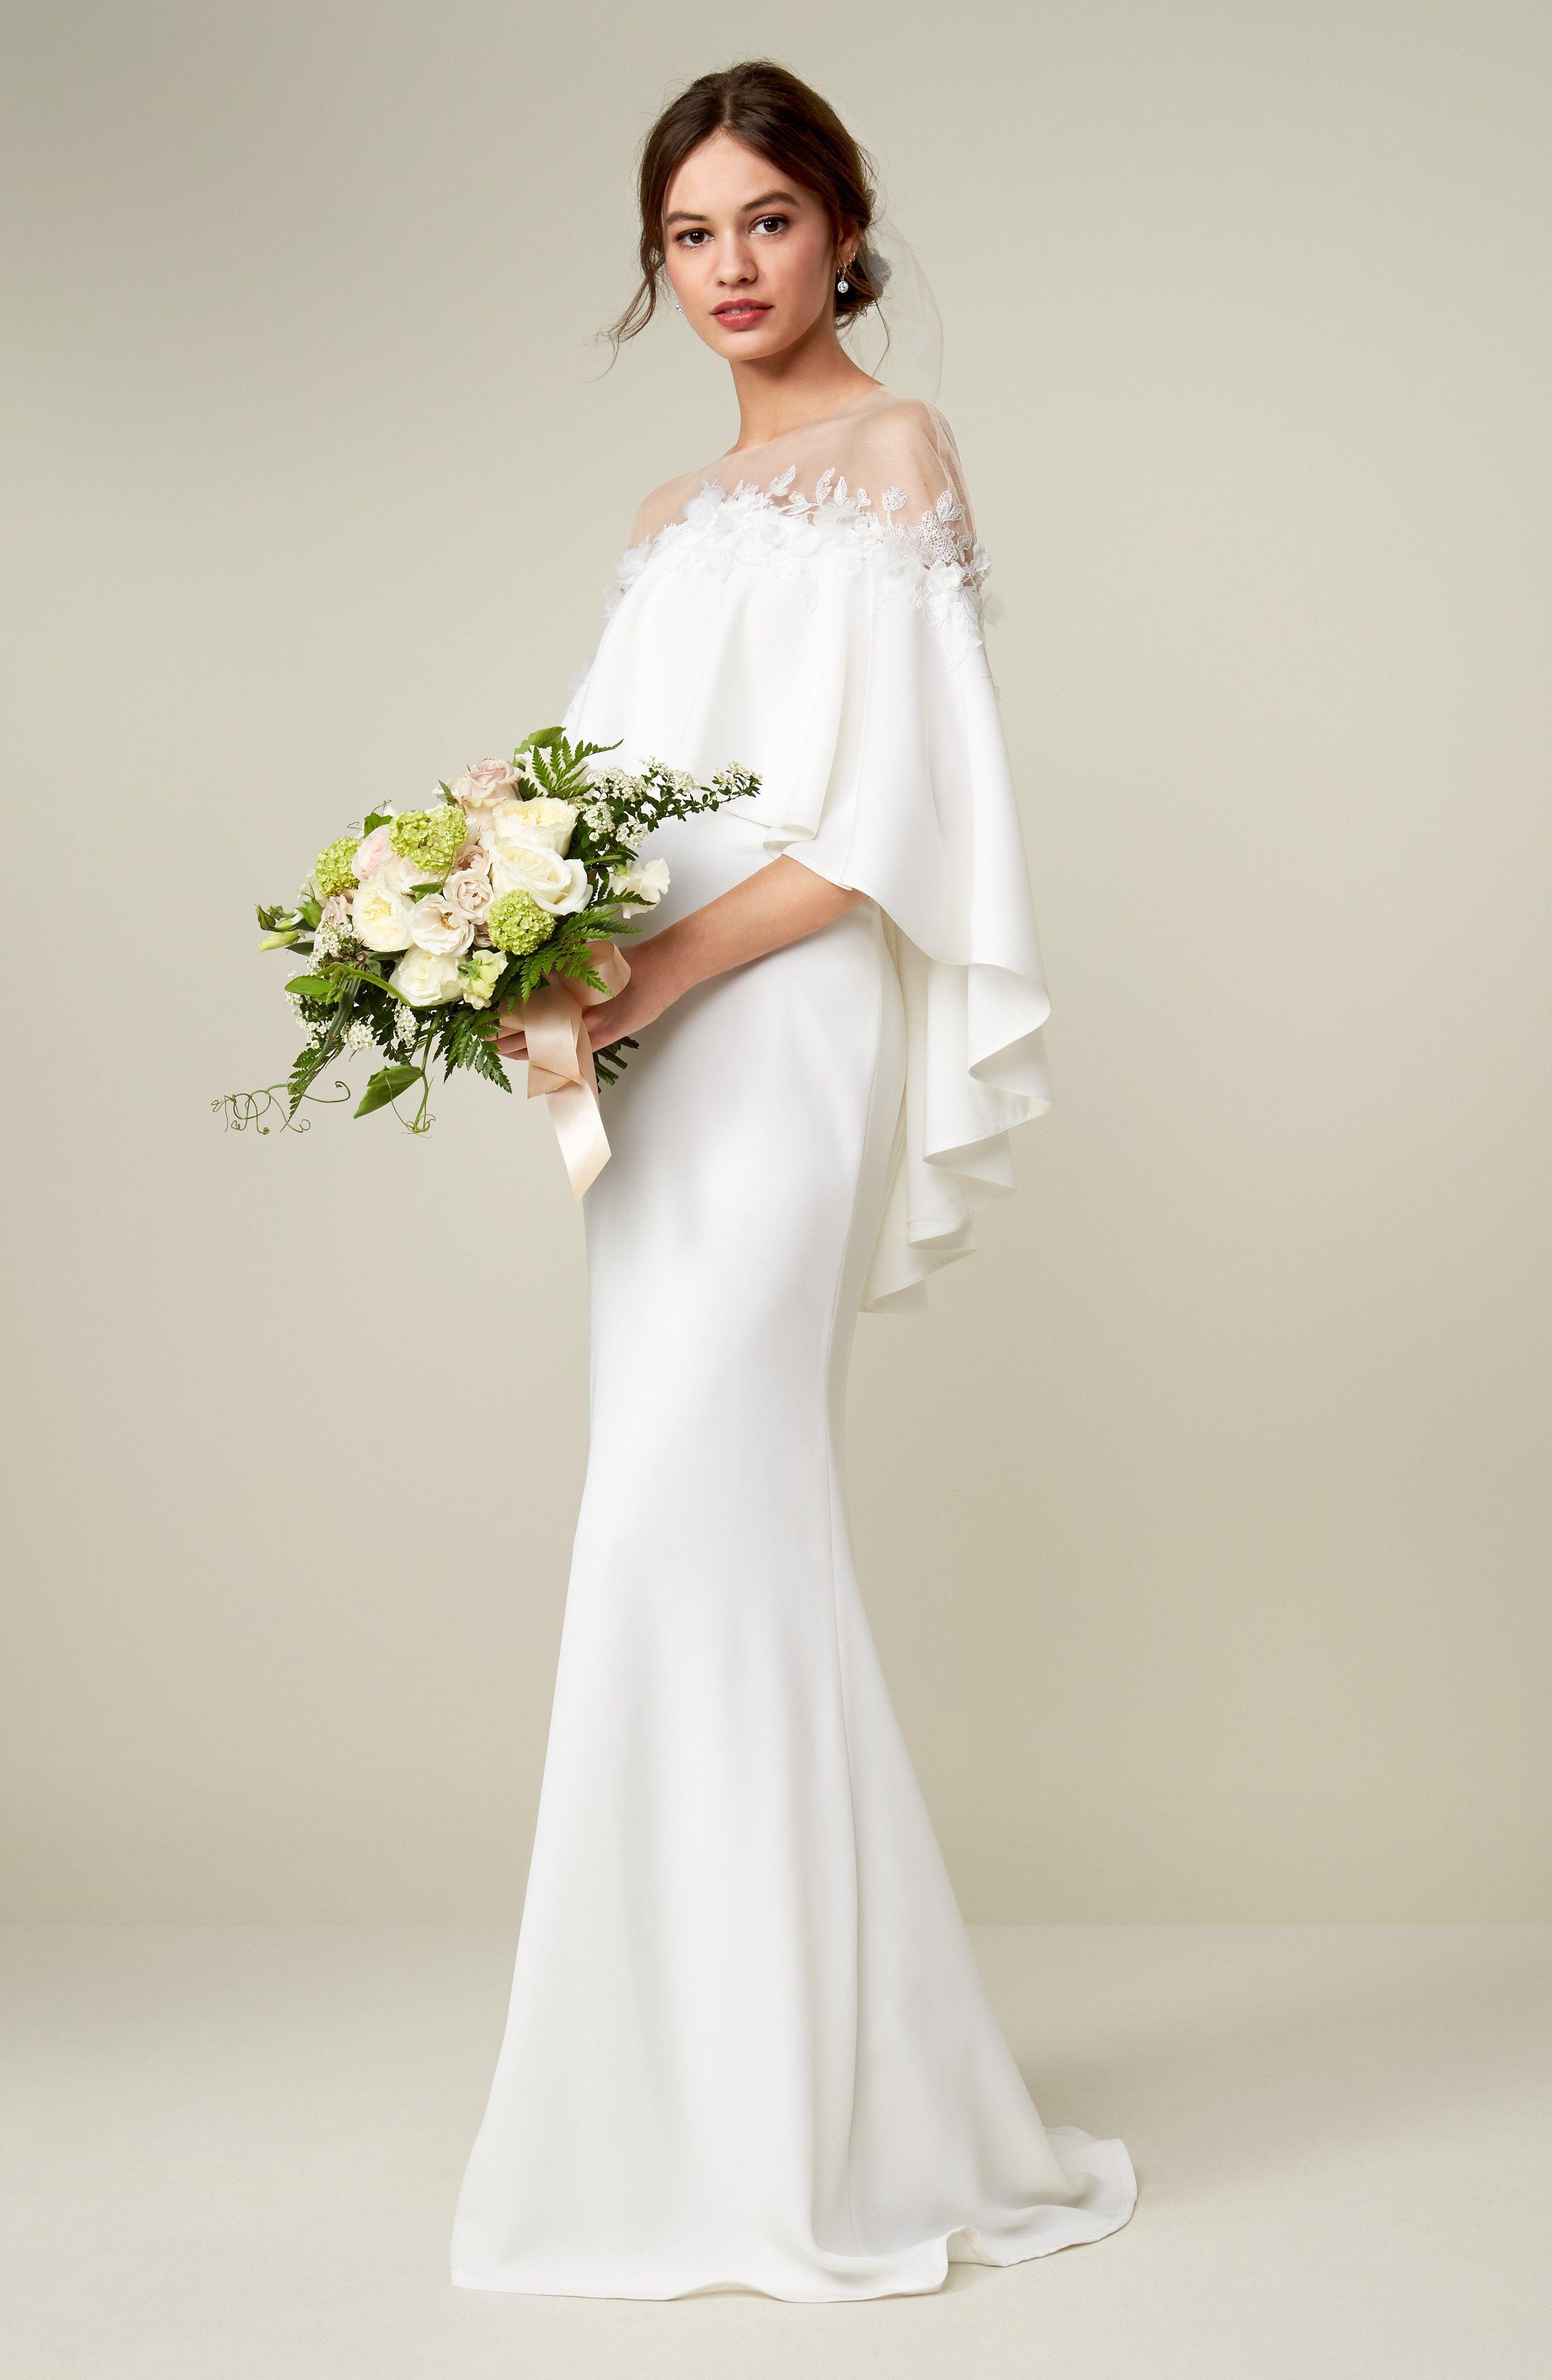 Off the Shoulder Popover Gown | Dream Wedding | Pinterest ...